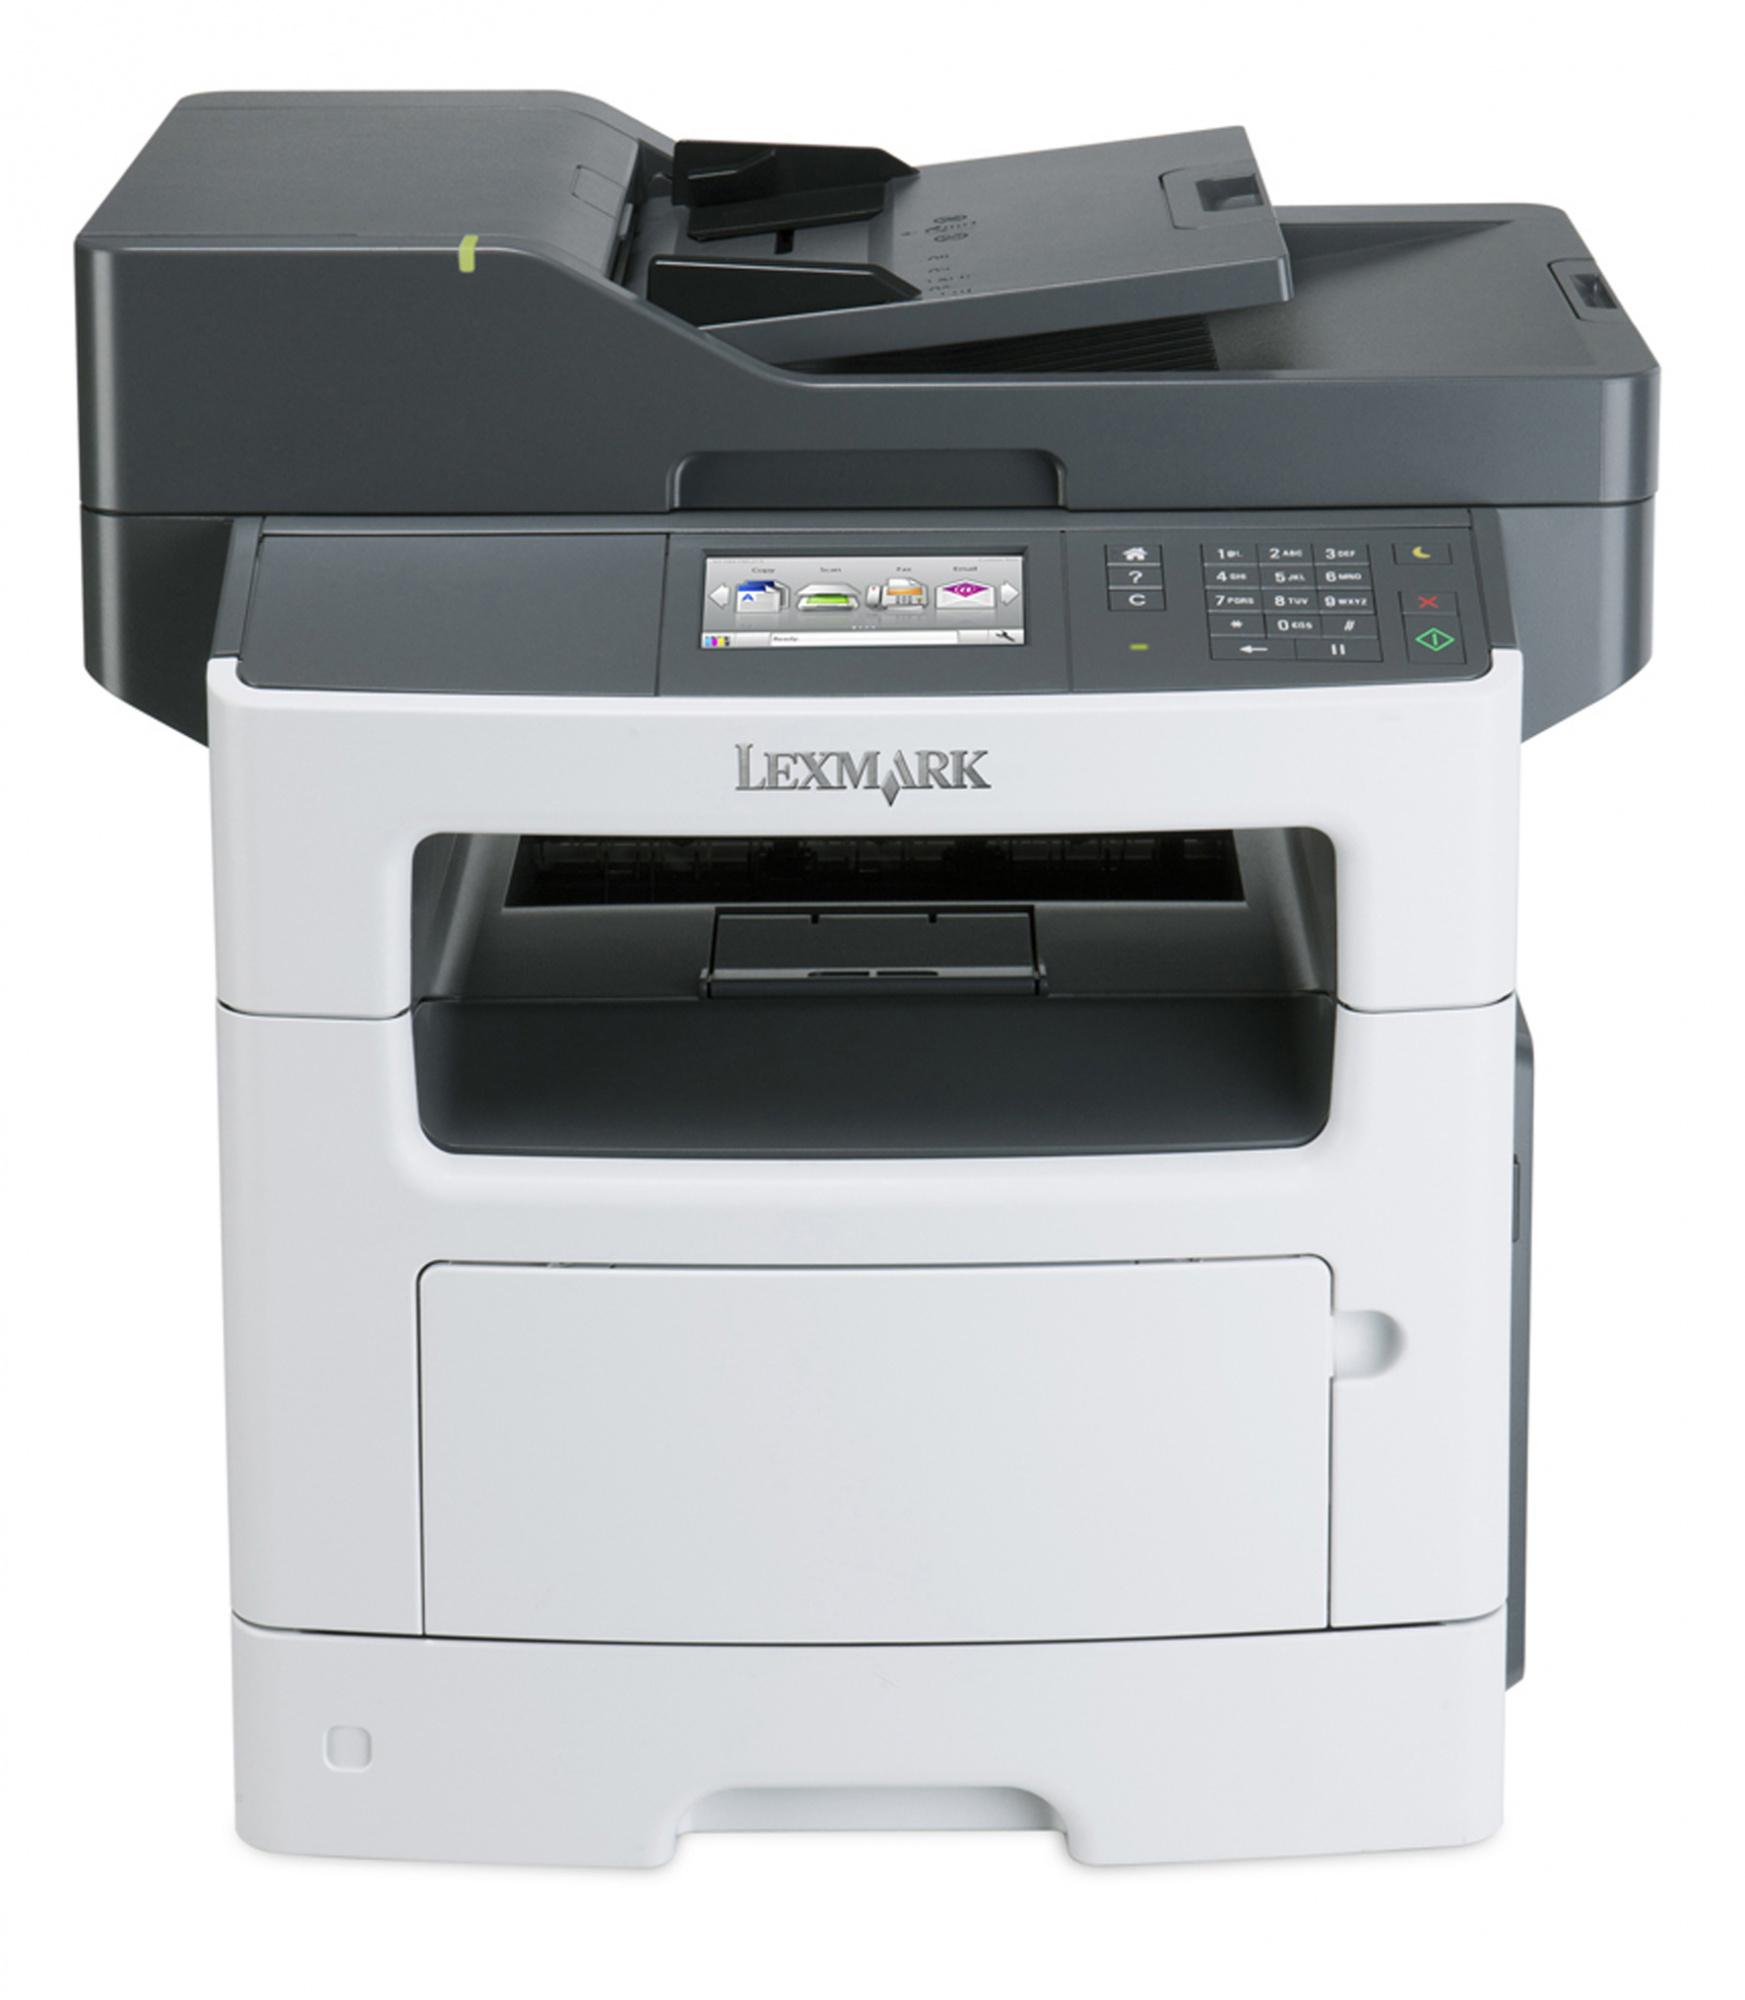 Lexmark MX511de (35S5803) - лазерное монохромное МФУ